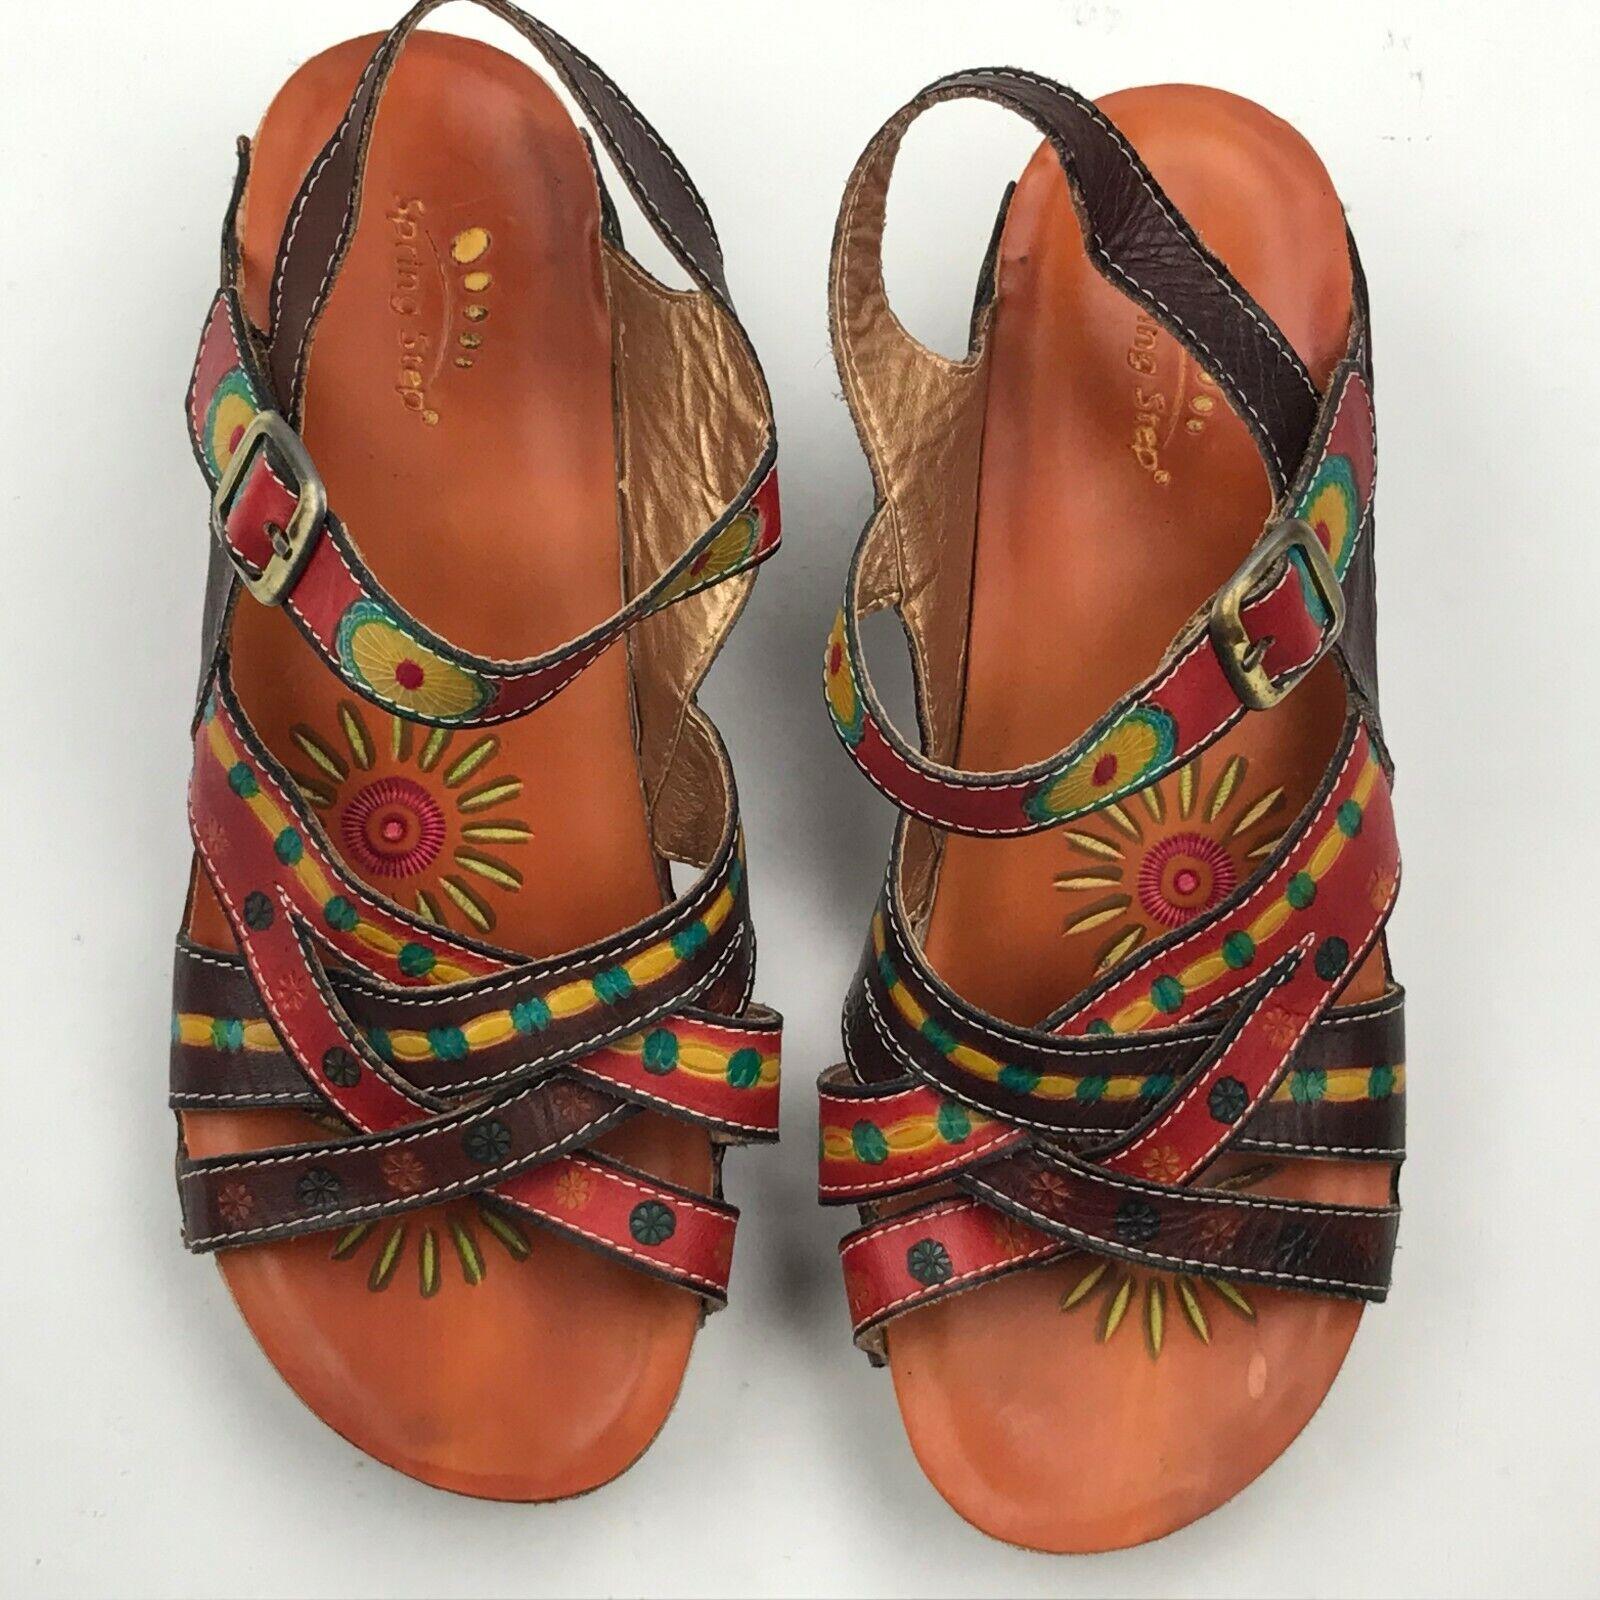 Spring Step D-UNION Multi-color Leather Strappy Sandal sz EU 37